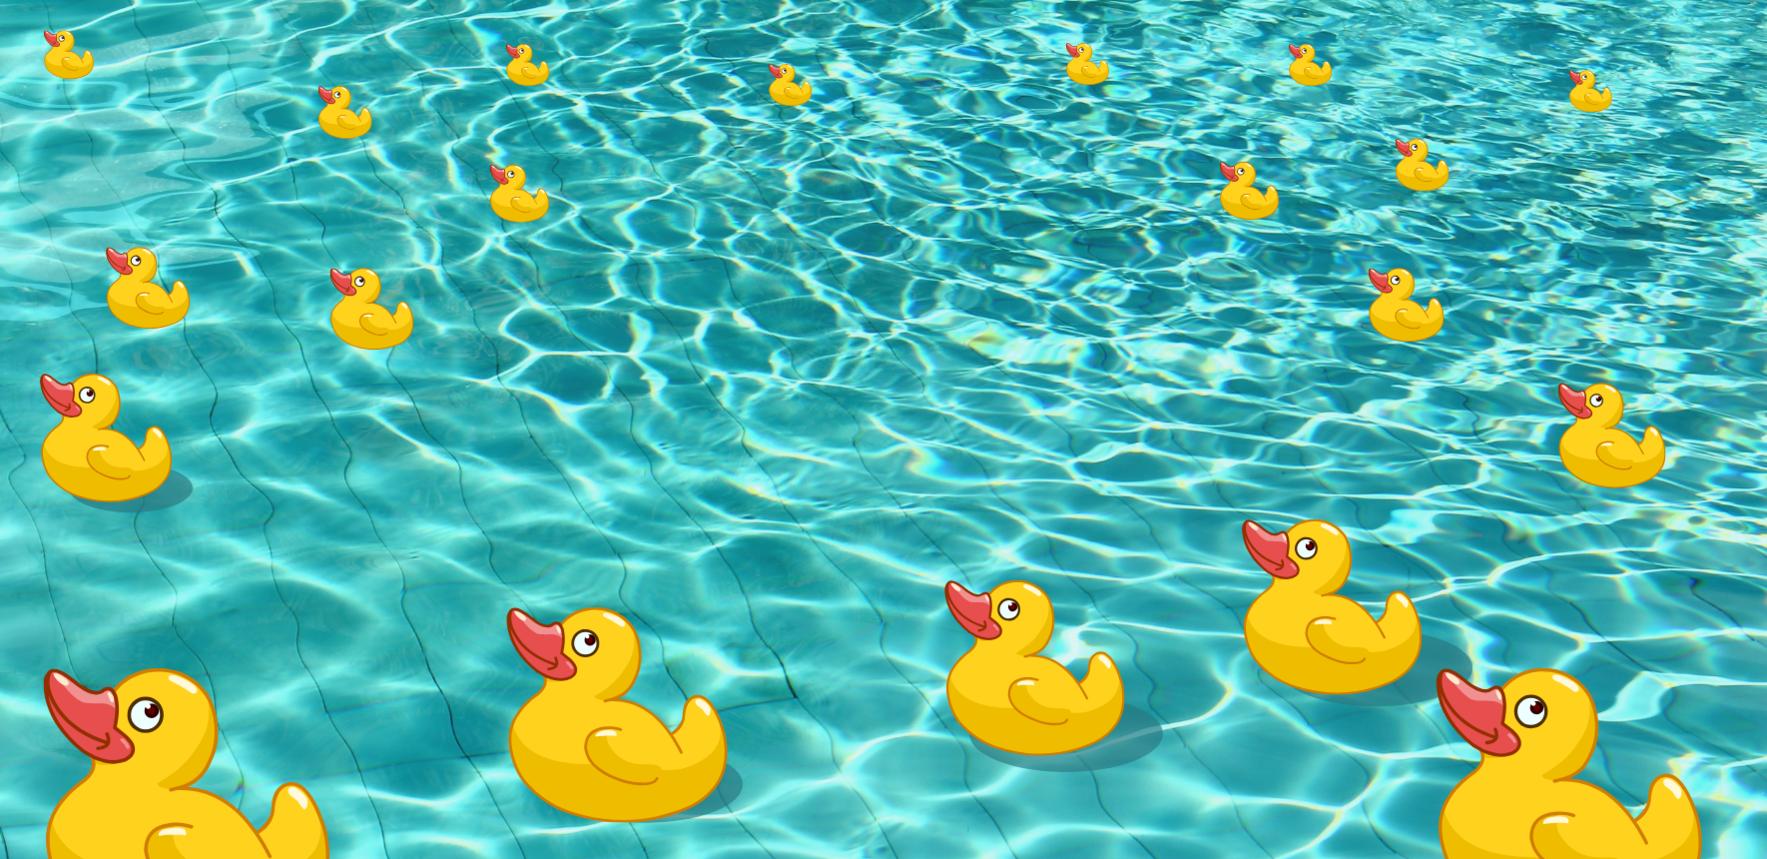 YWCA Splash for Cash Duck Drawing image